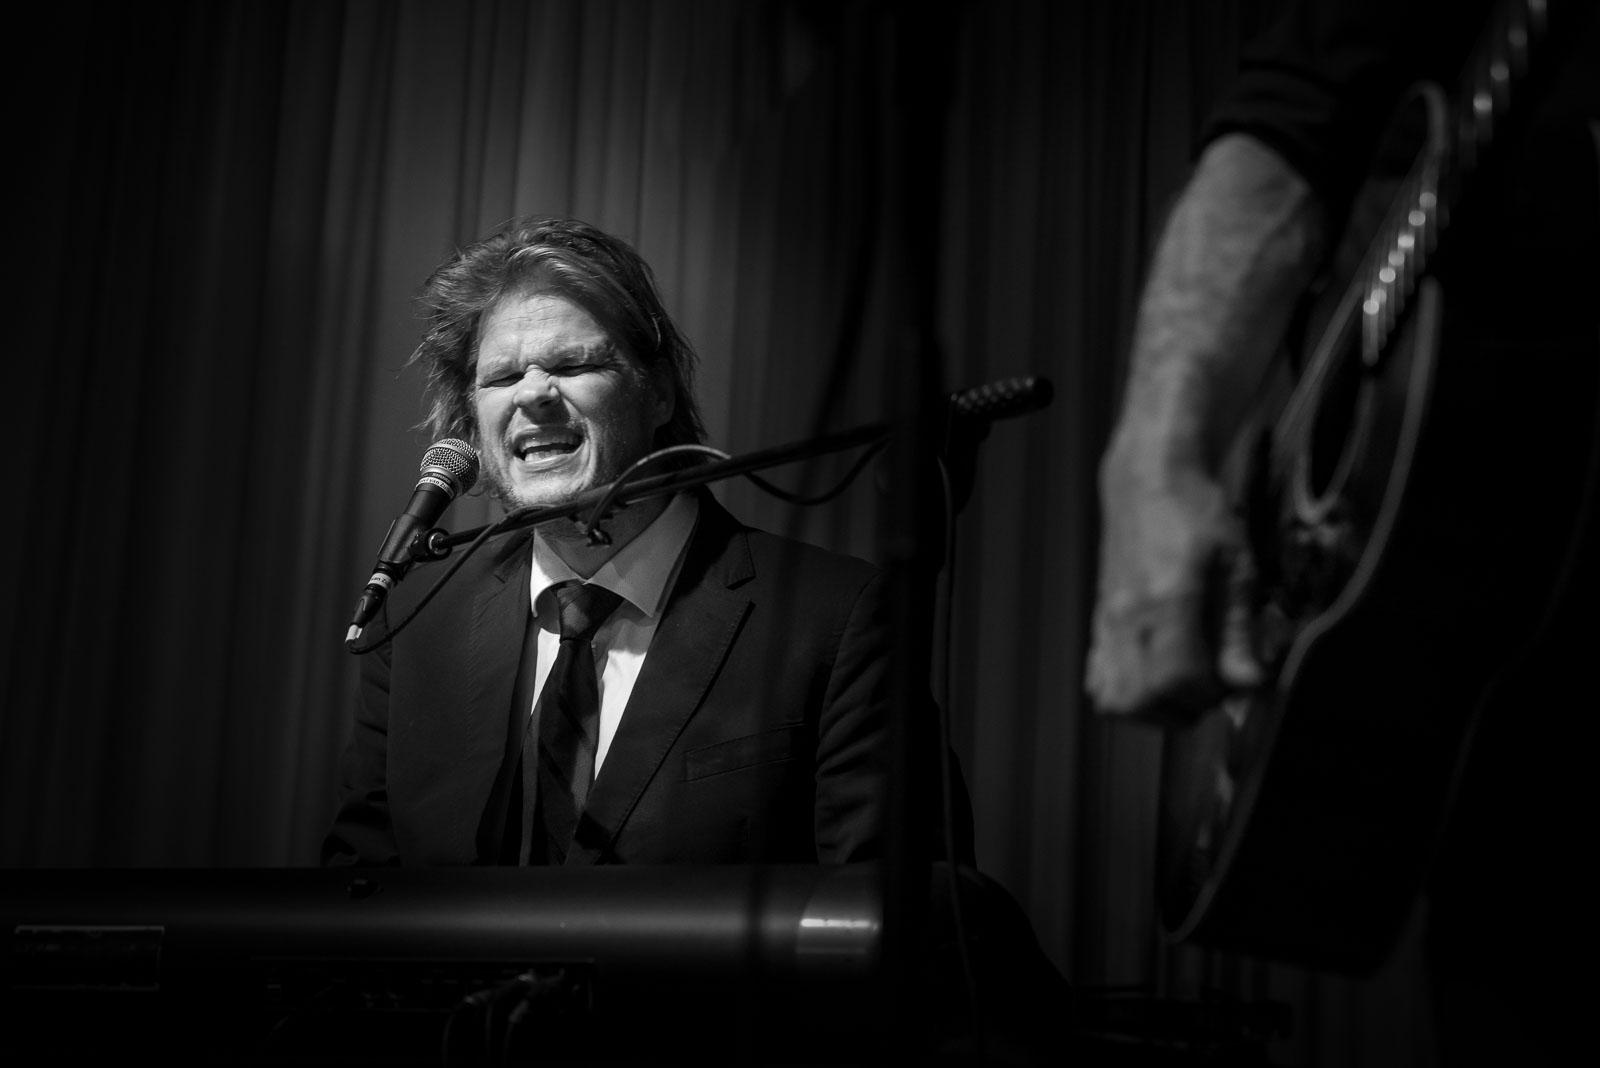 Roel Spanjers en JW Joy Parelsessies Concertfoto optreden